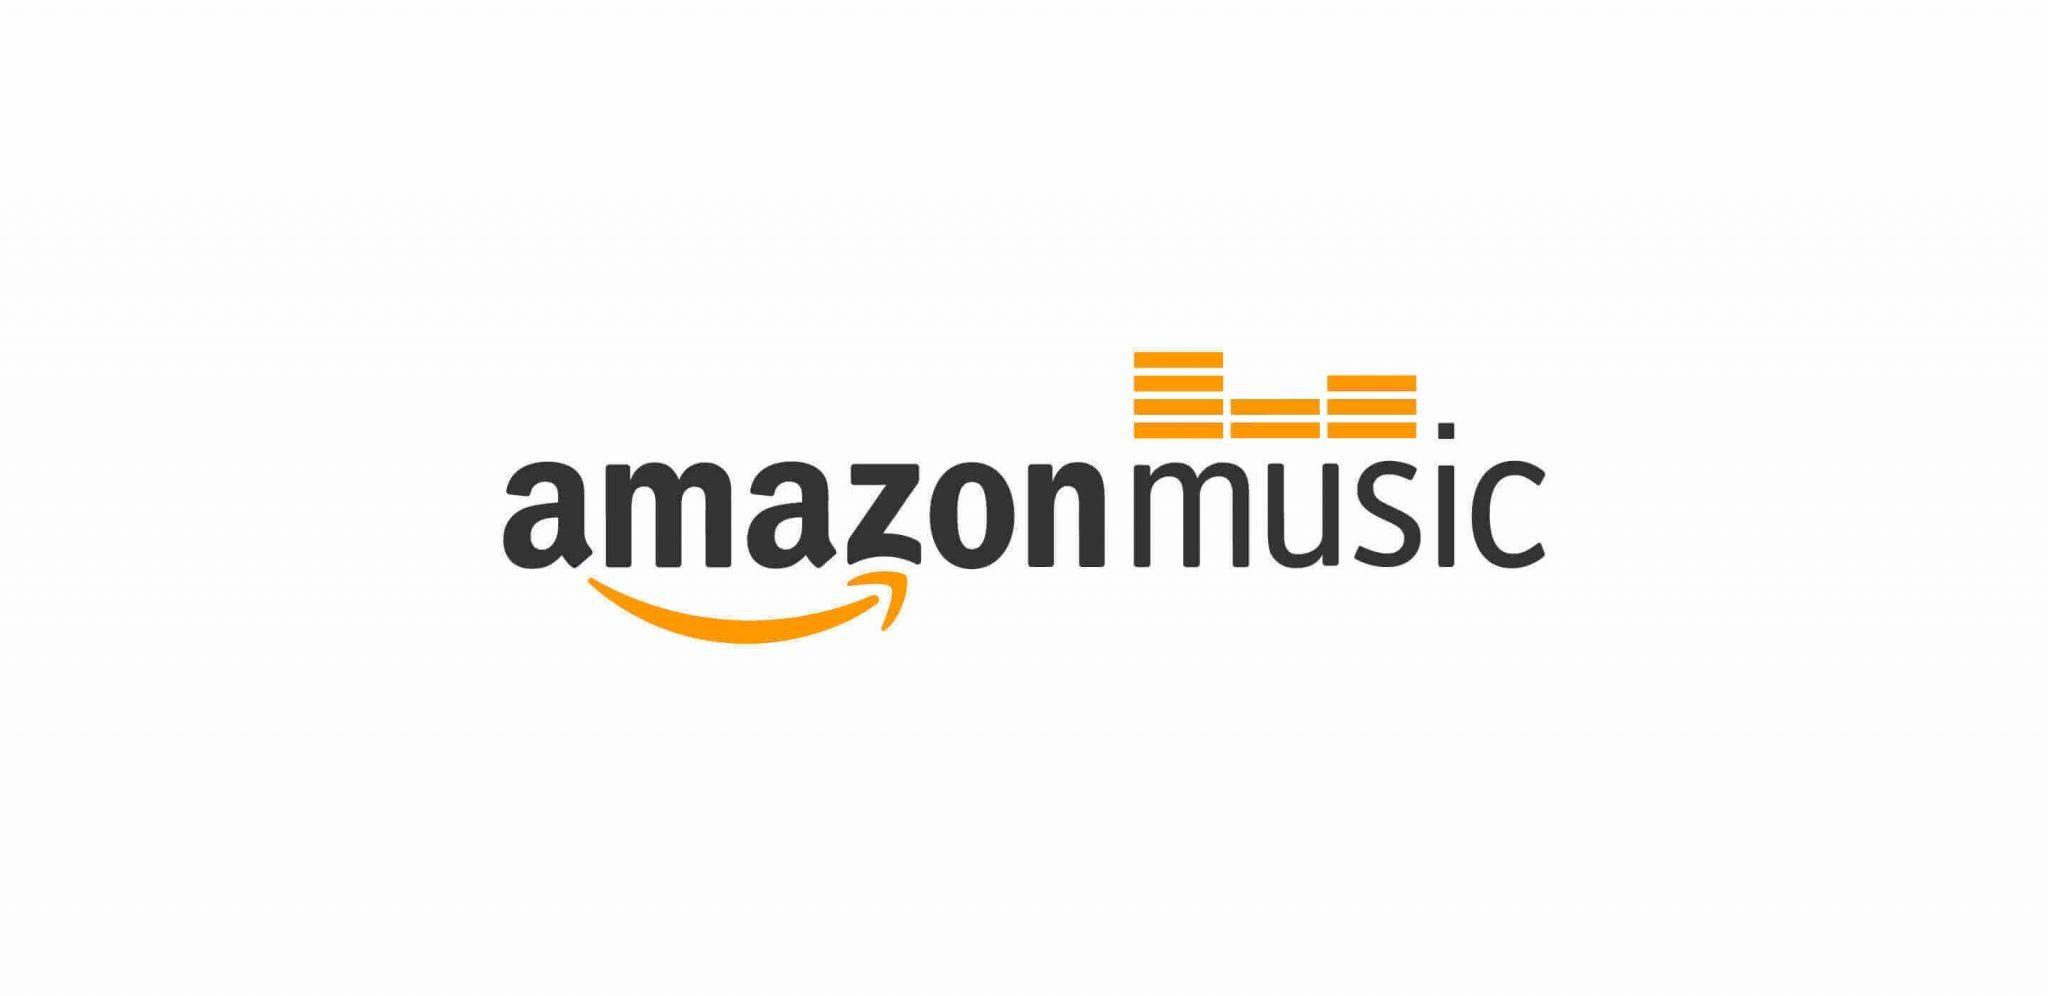 mejores sitios de descarga de música gratis